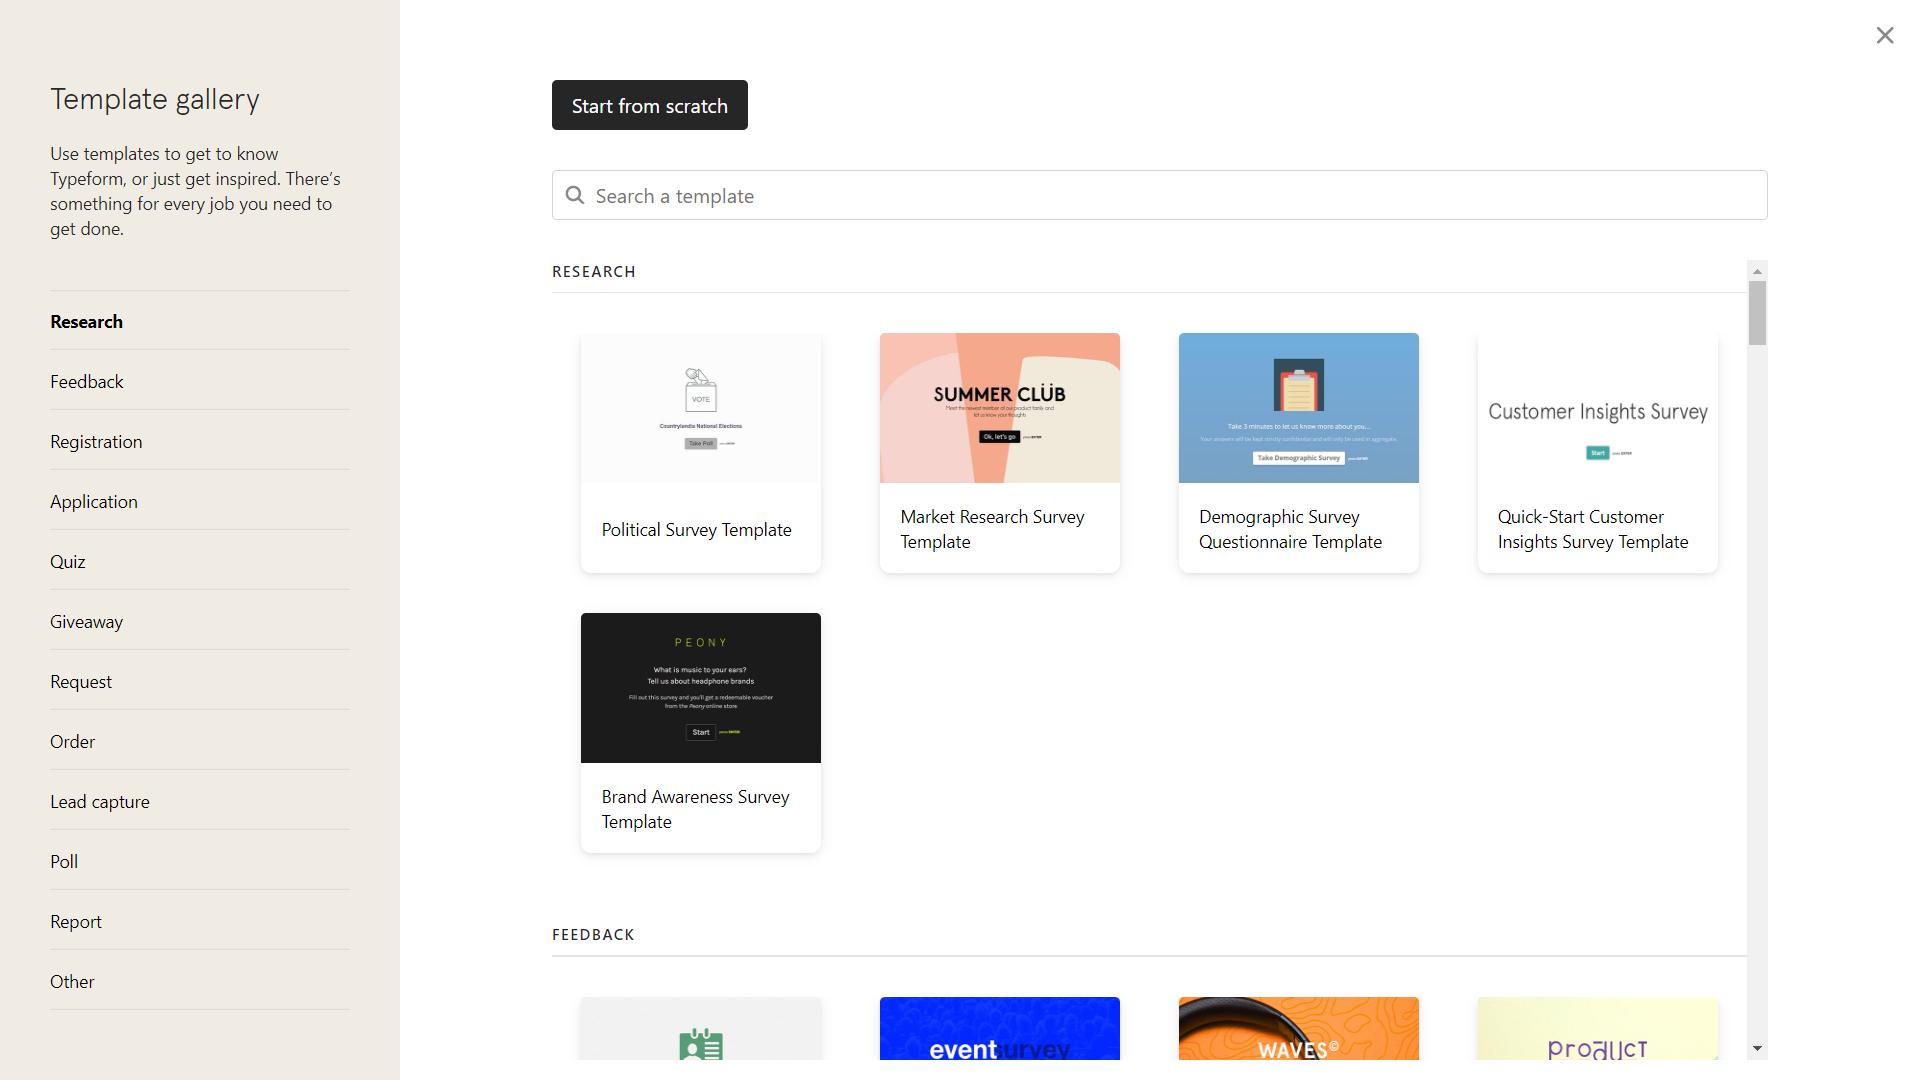 Screenshot of Typeform Template Gallery